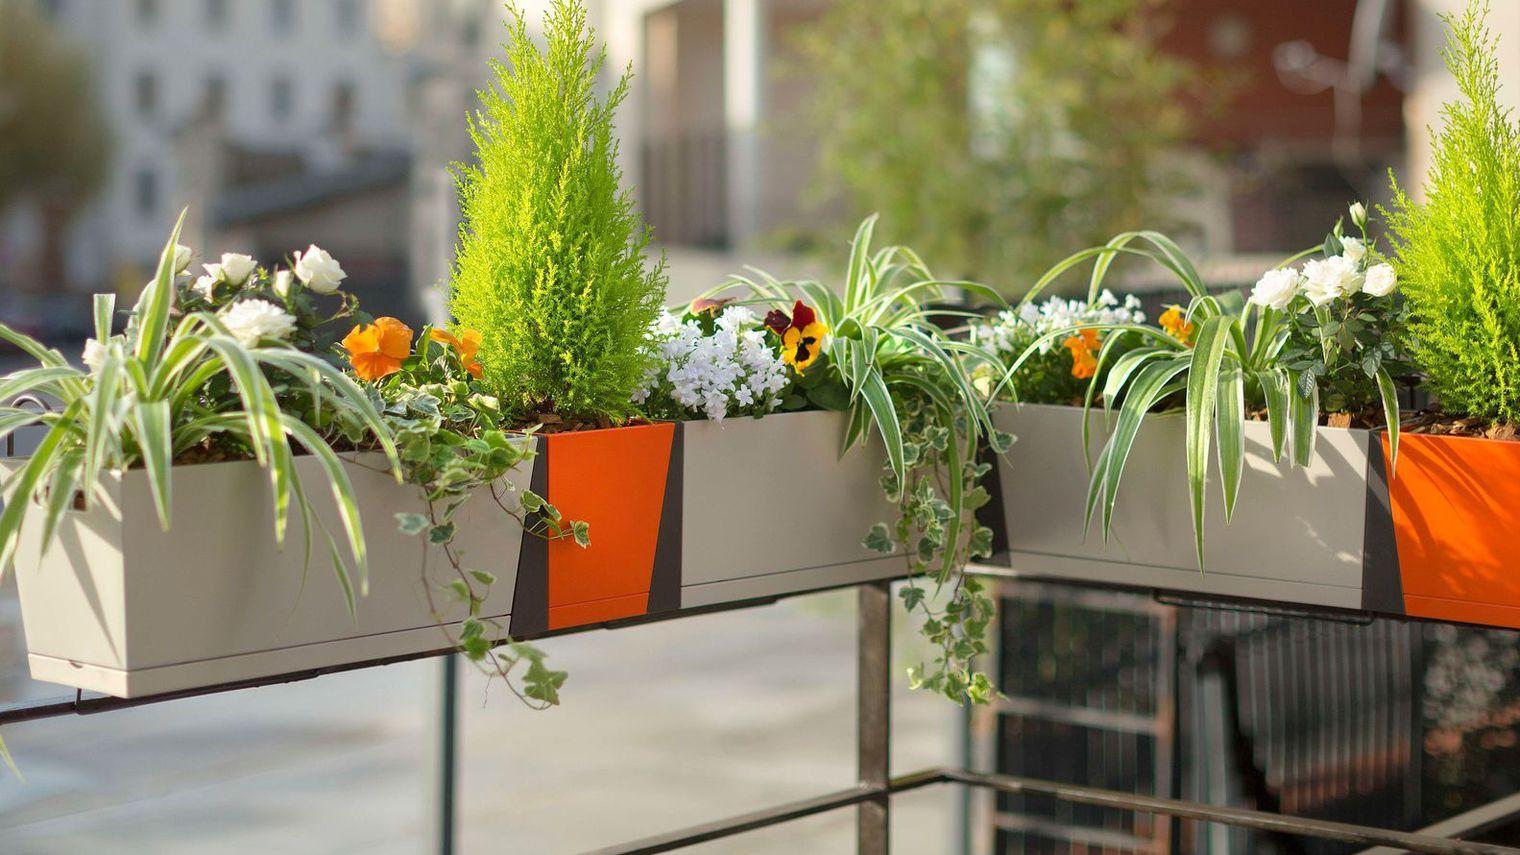 Support Jardiniere Balcon Avec Sapin En Pot Pour Terrasse Awesome